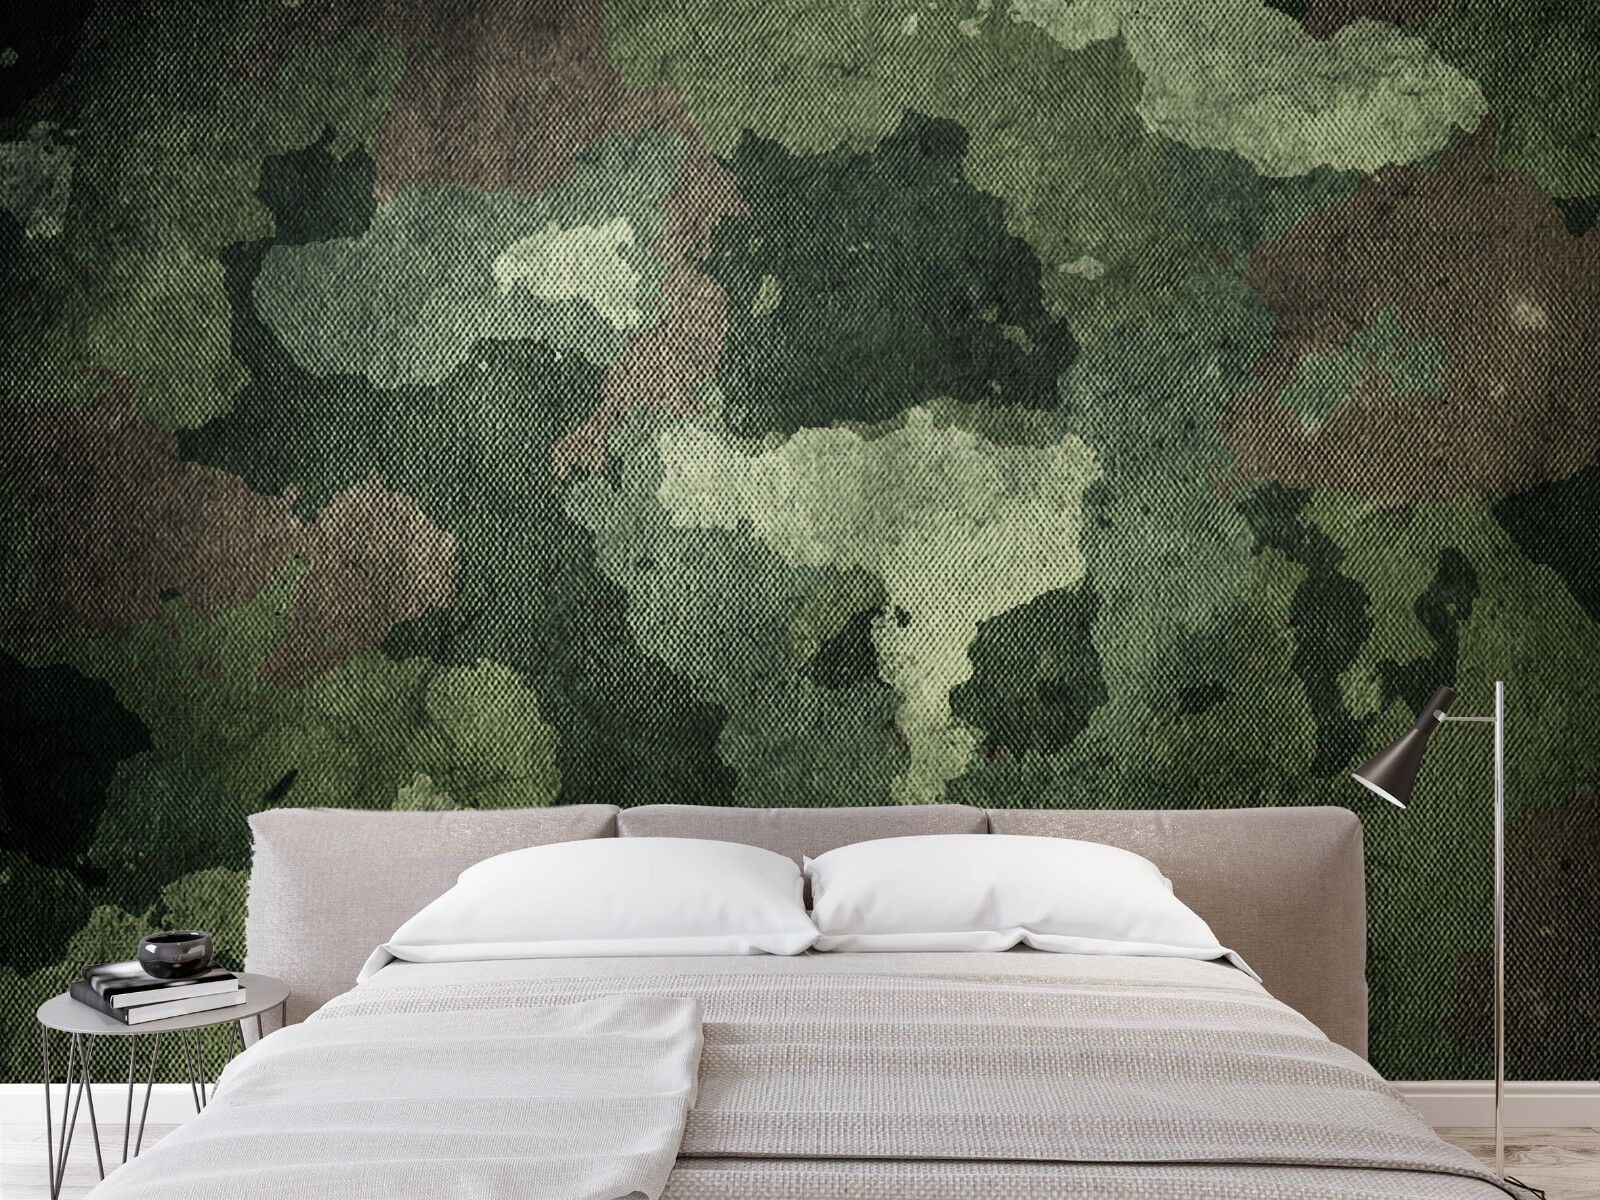 3D Grün Art 7022 Wall Paper Print Wall Decal Deco Indoor Wall Murals US Summer